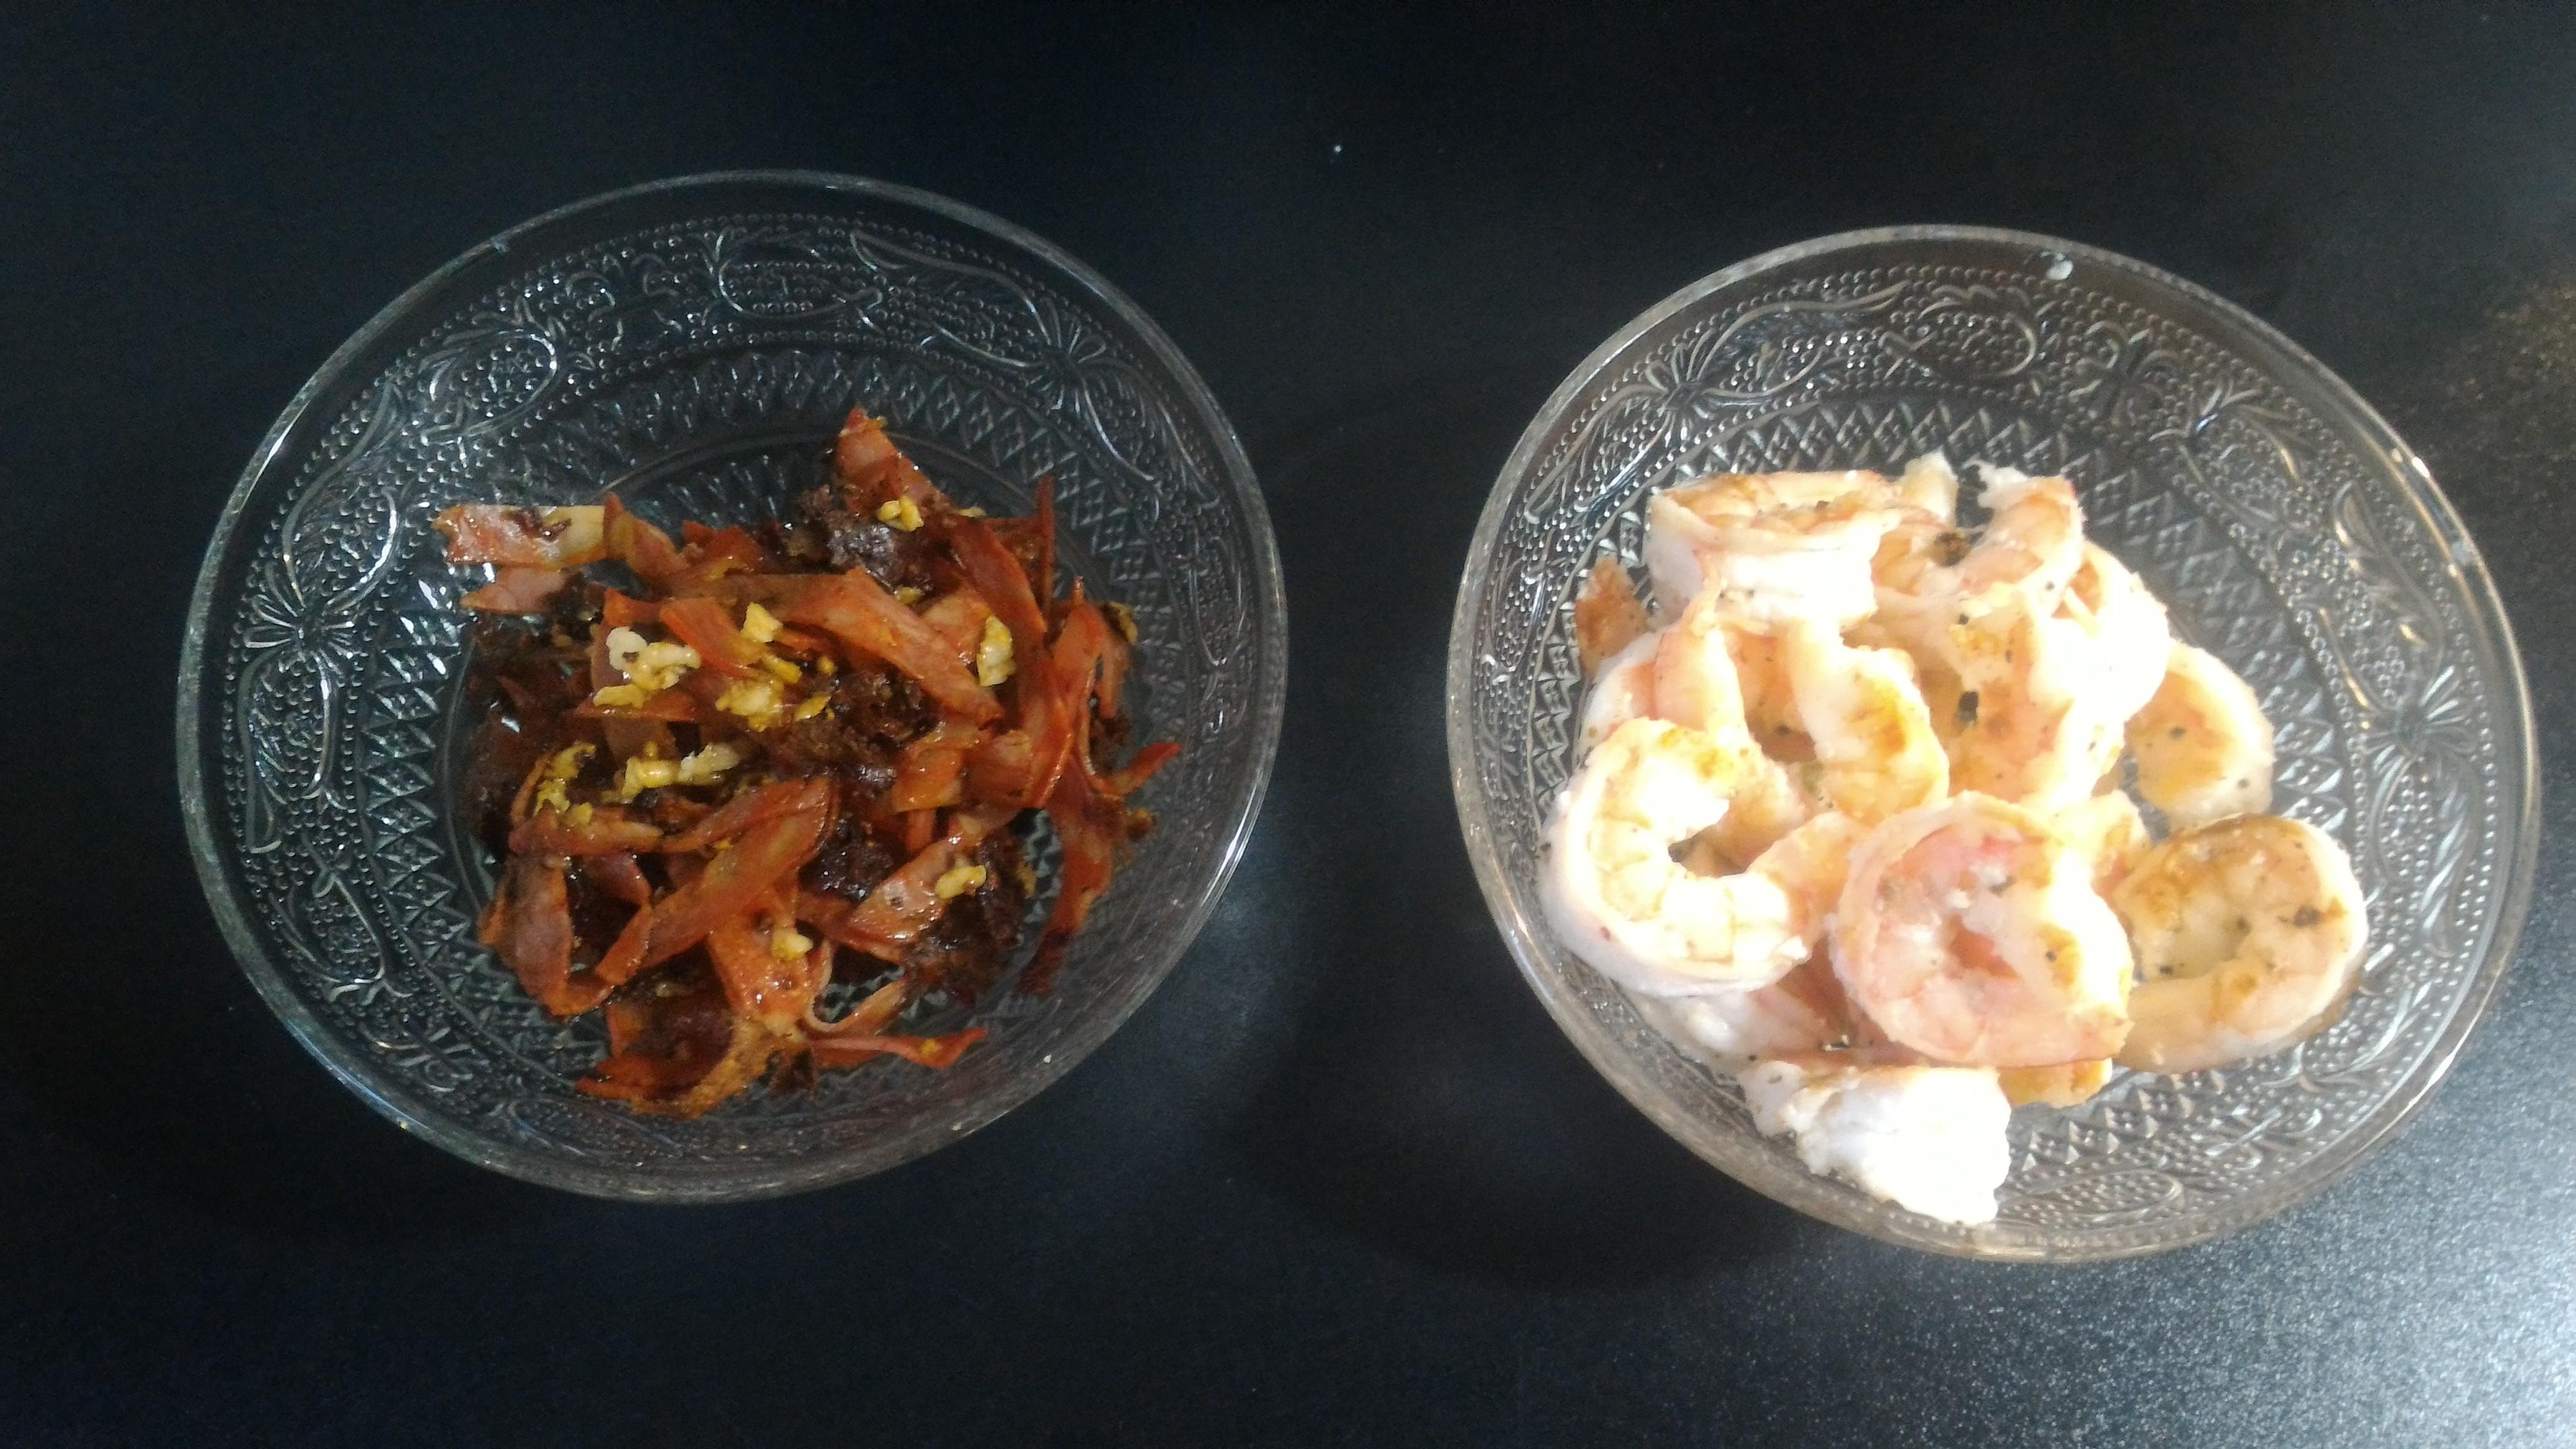 Qu'est-ce qu'on mange #3 : Les Spaghetti Chorizo Et Crevettes